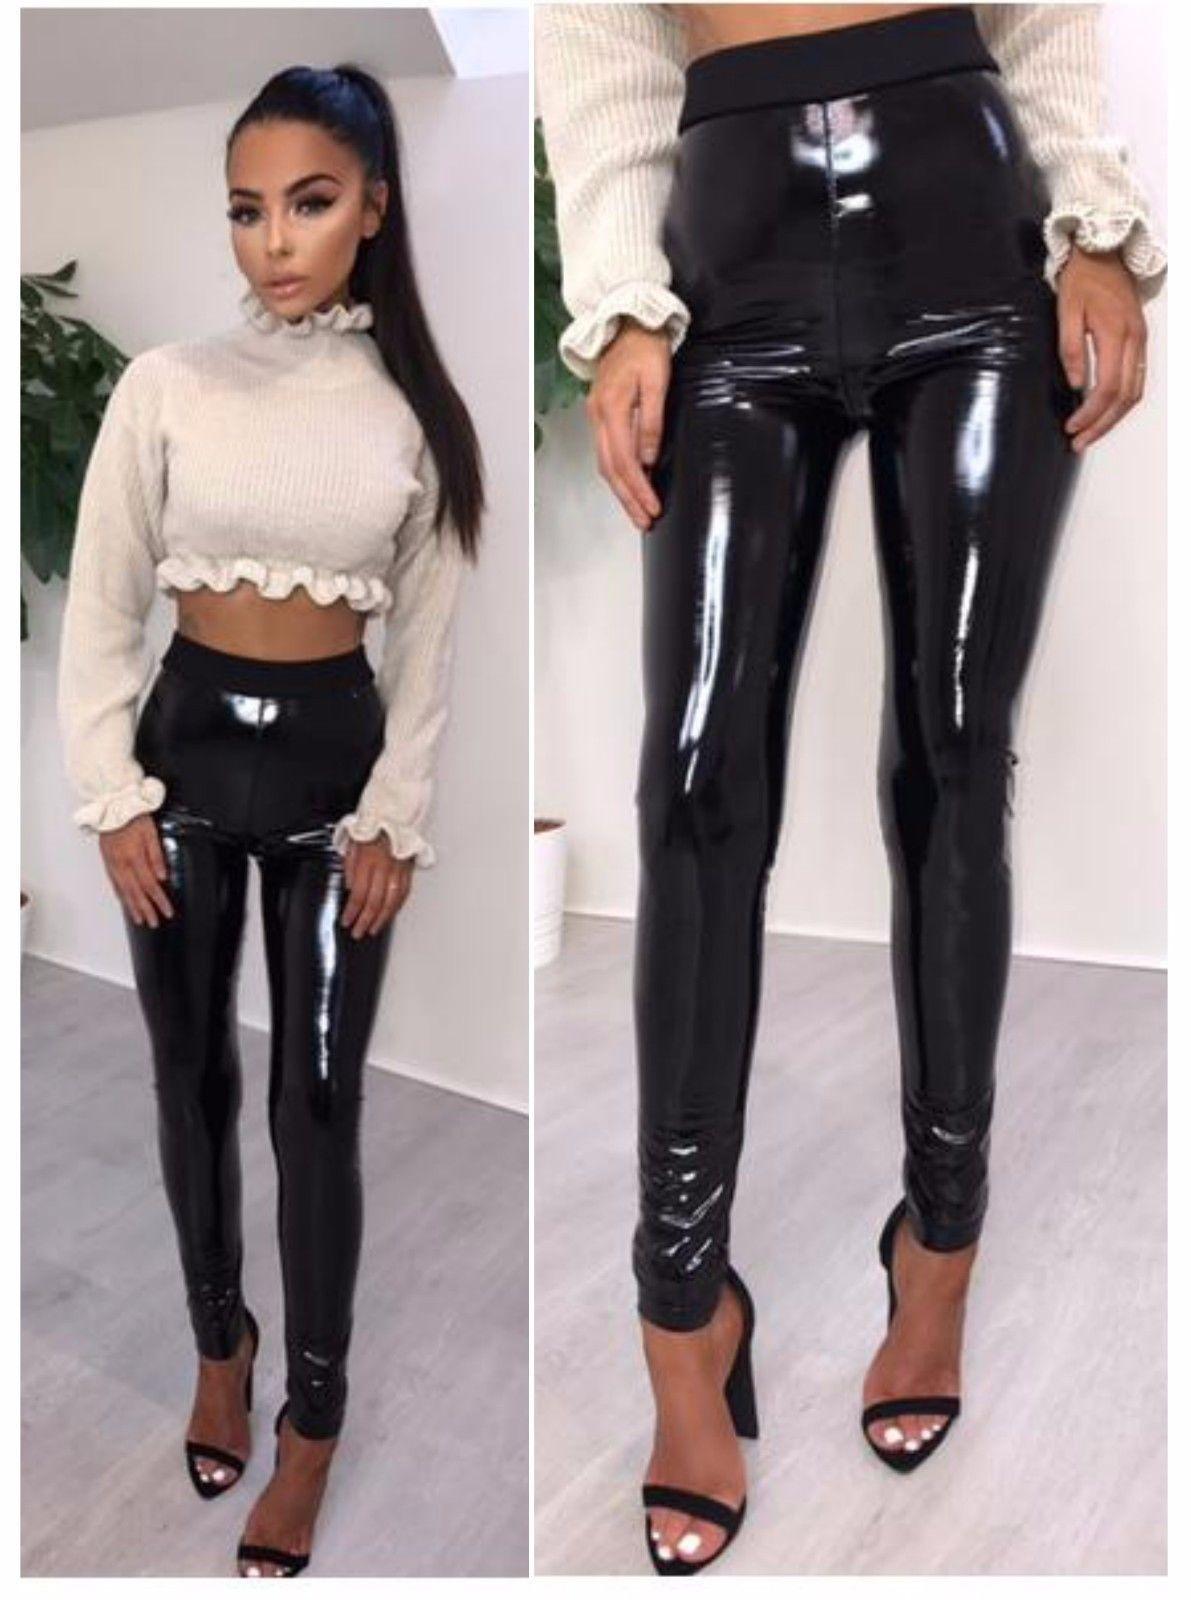 689963a8b872d 2018 New Fashion Womens Ladies Soft Strethcy Shiny Wet Look PU ...